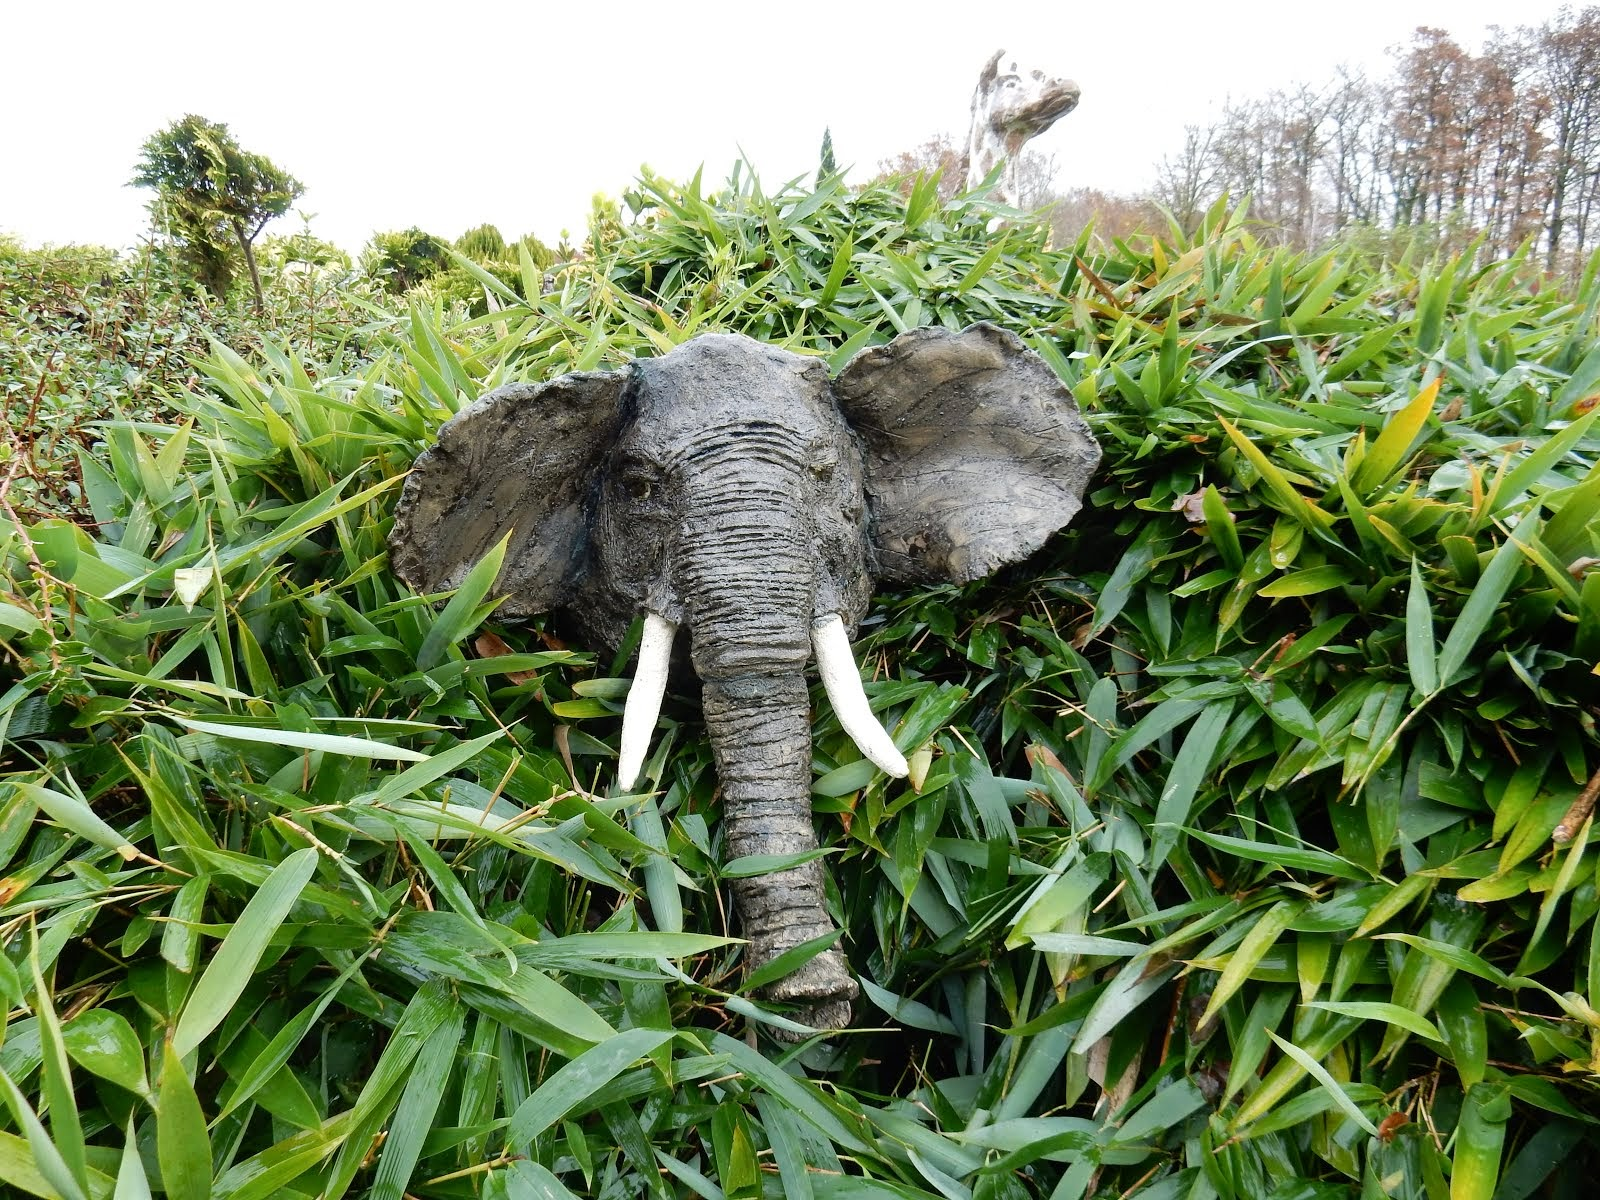 tête d'éléphant*